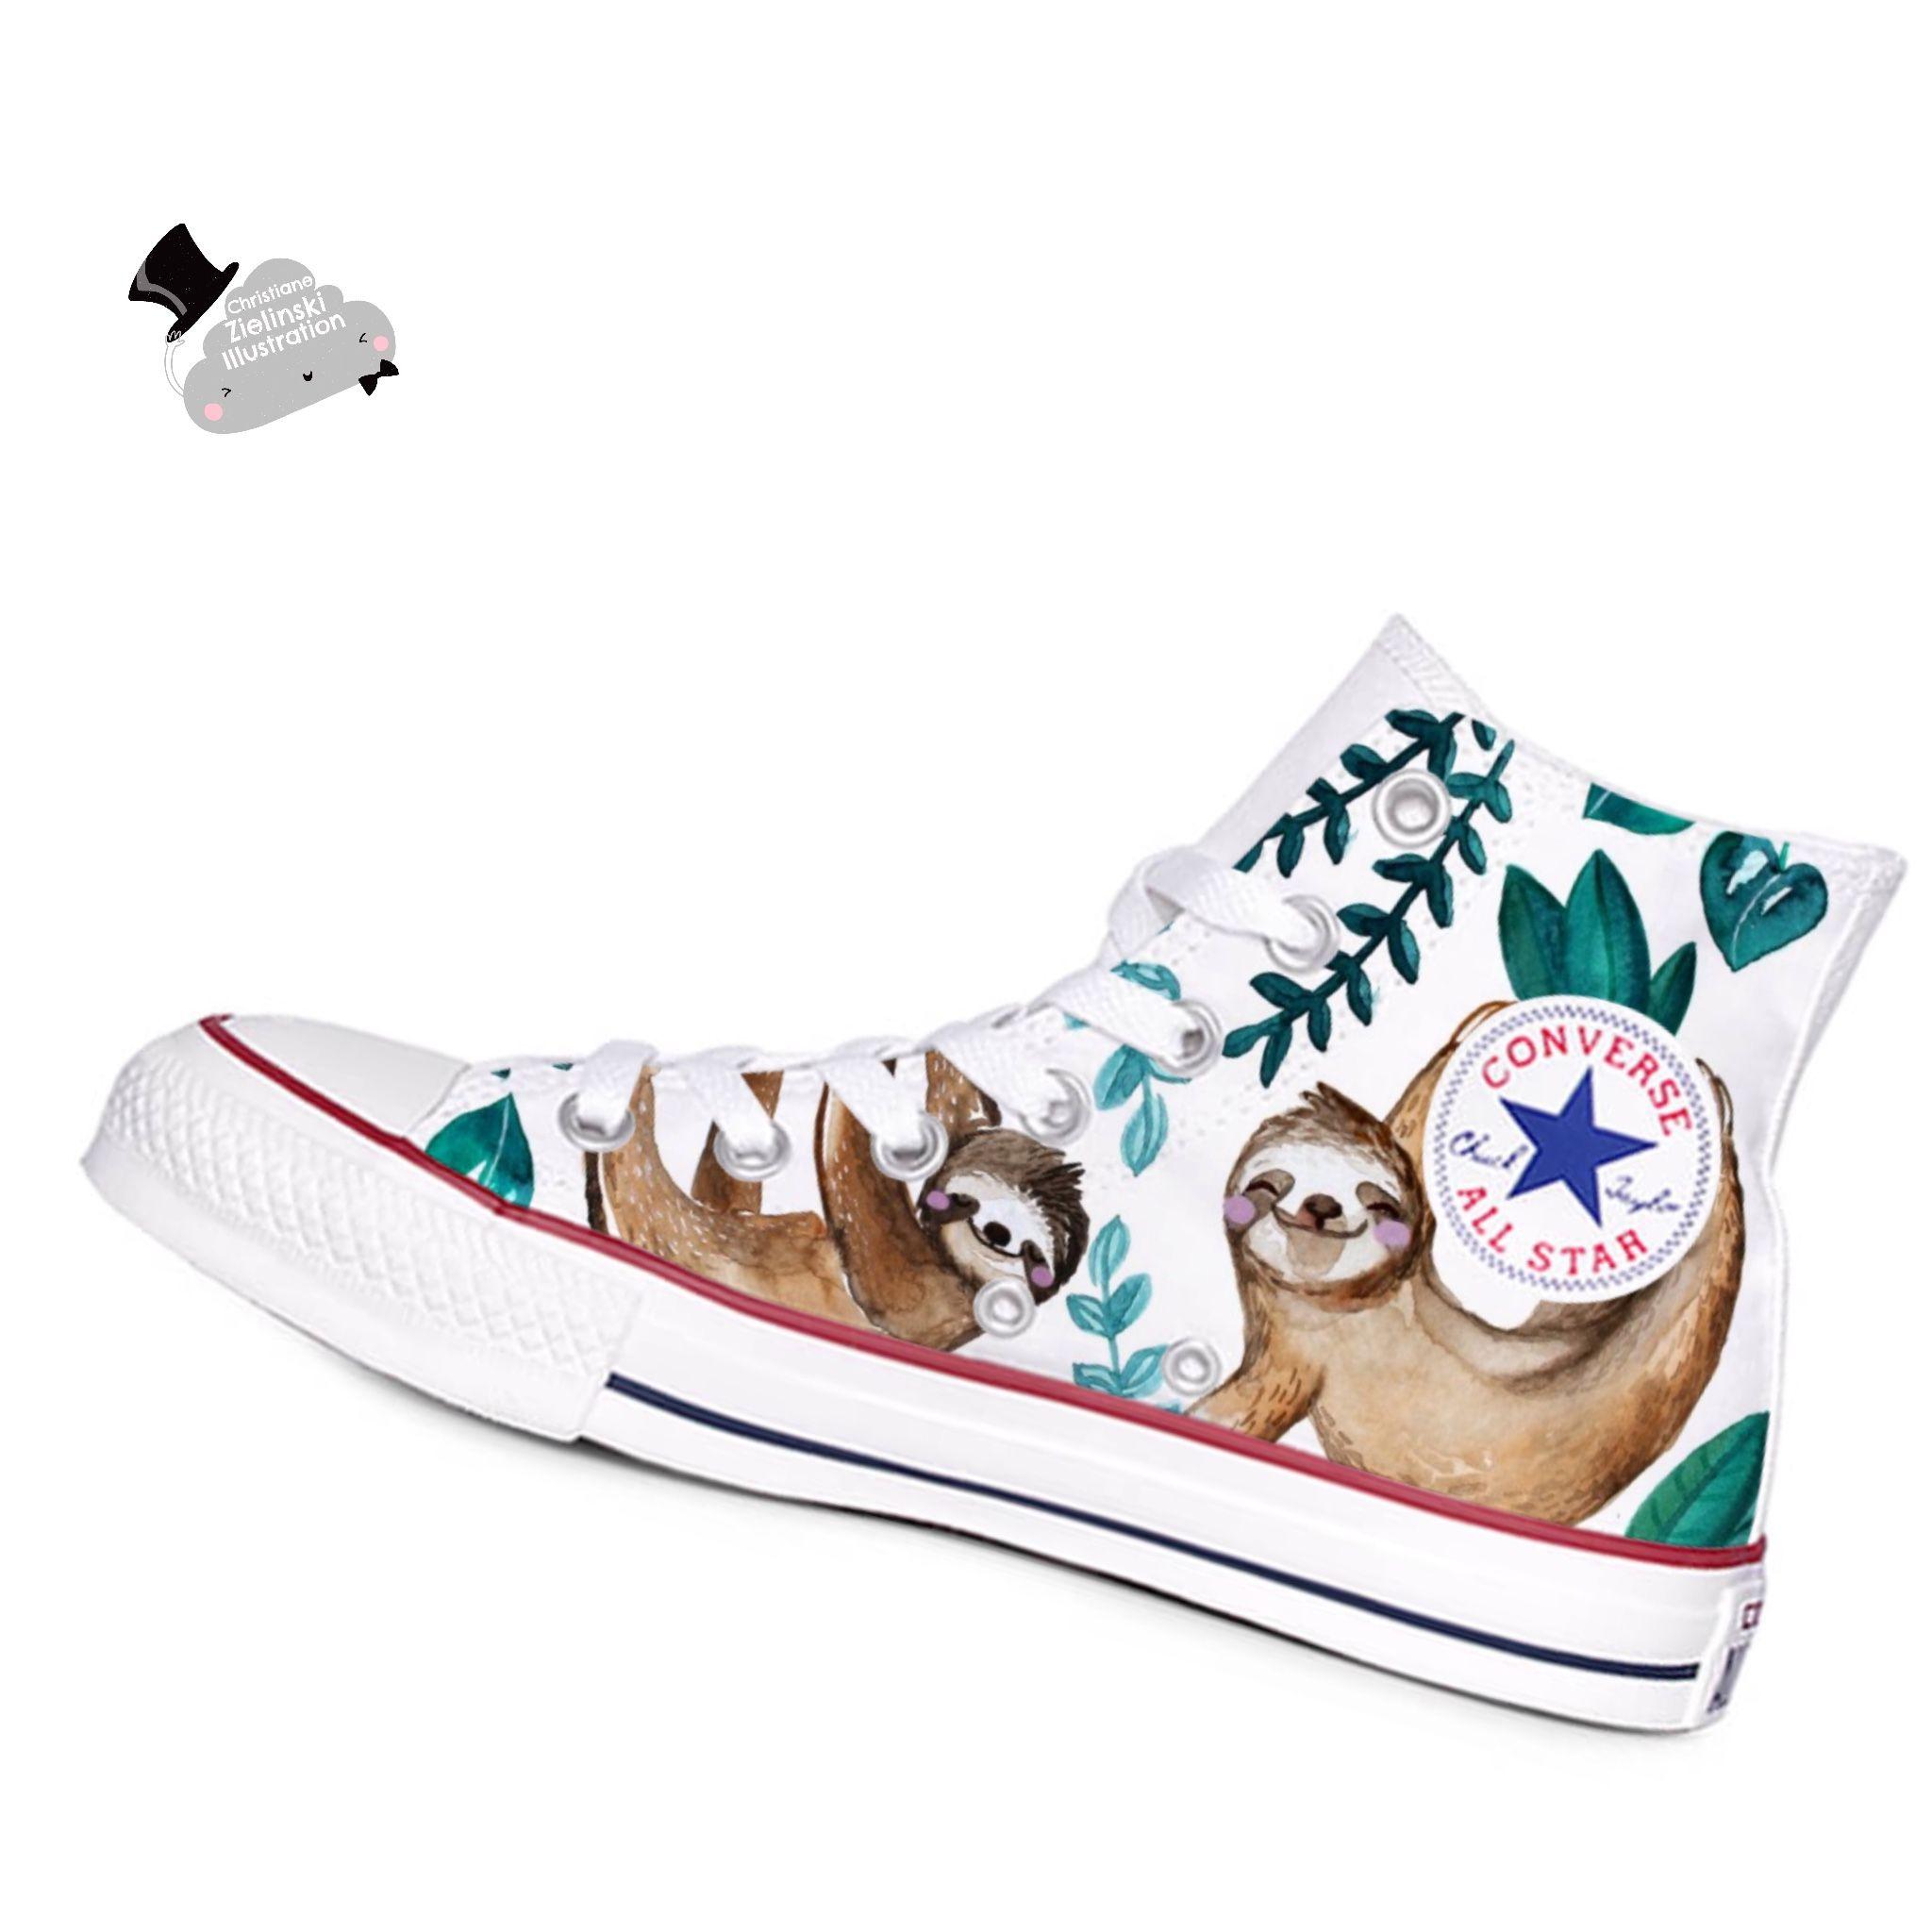 Love Sloth converse chucks Design by